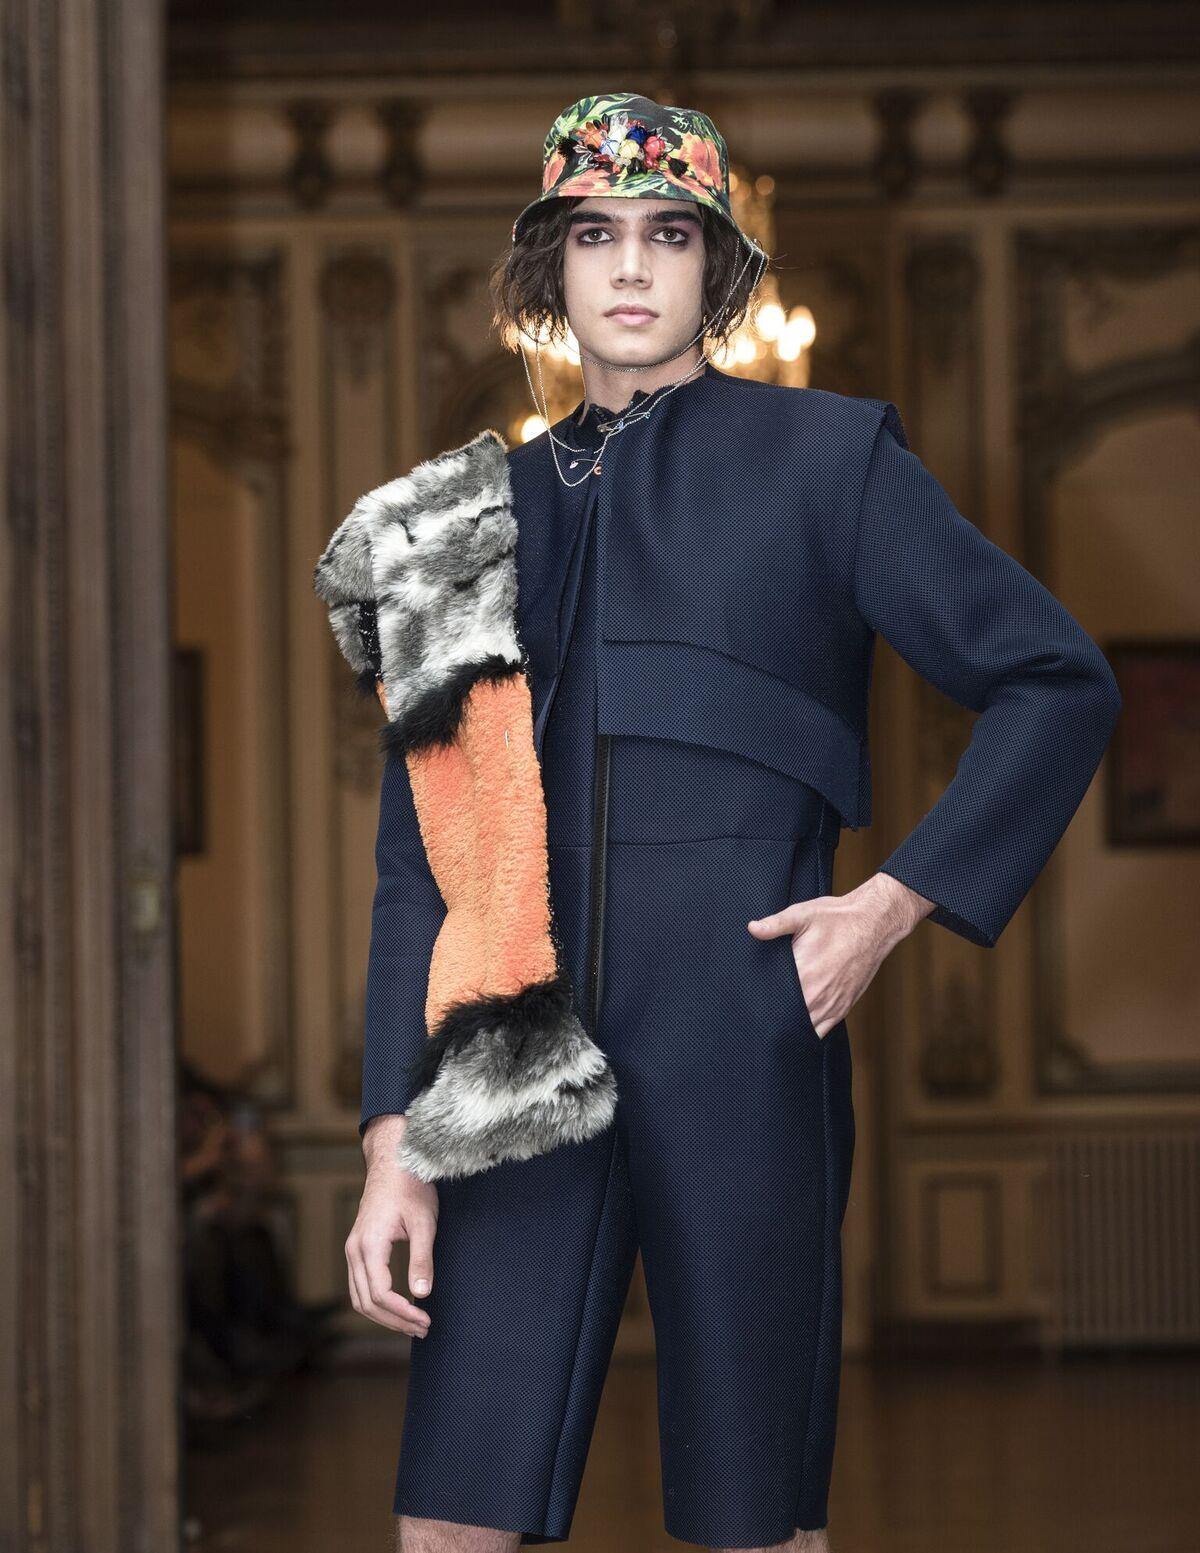 Shaleva freedom ss20 during paris fashion week (7)